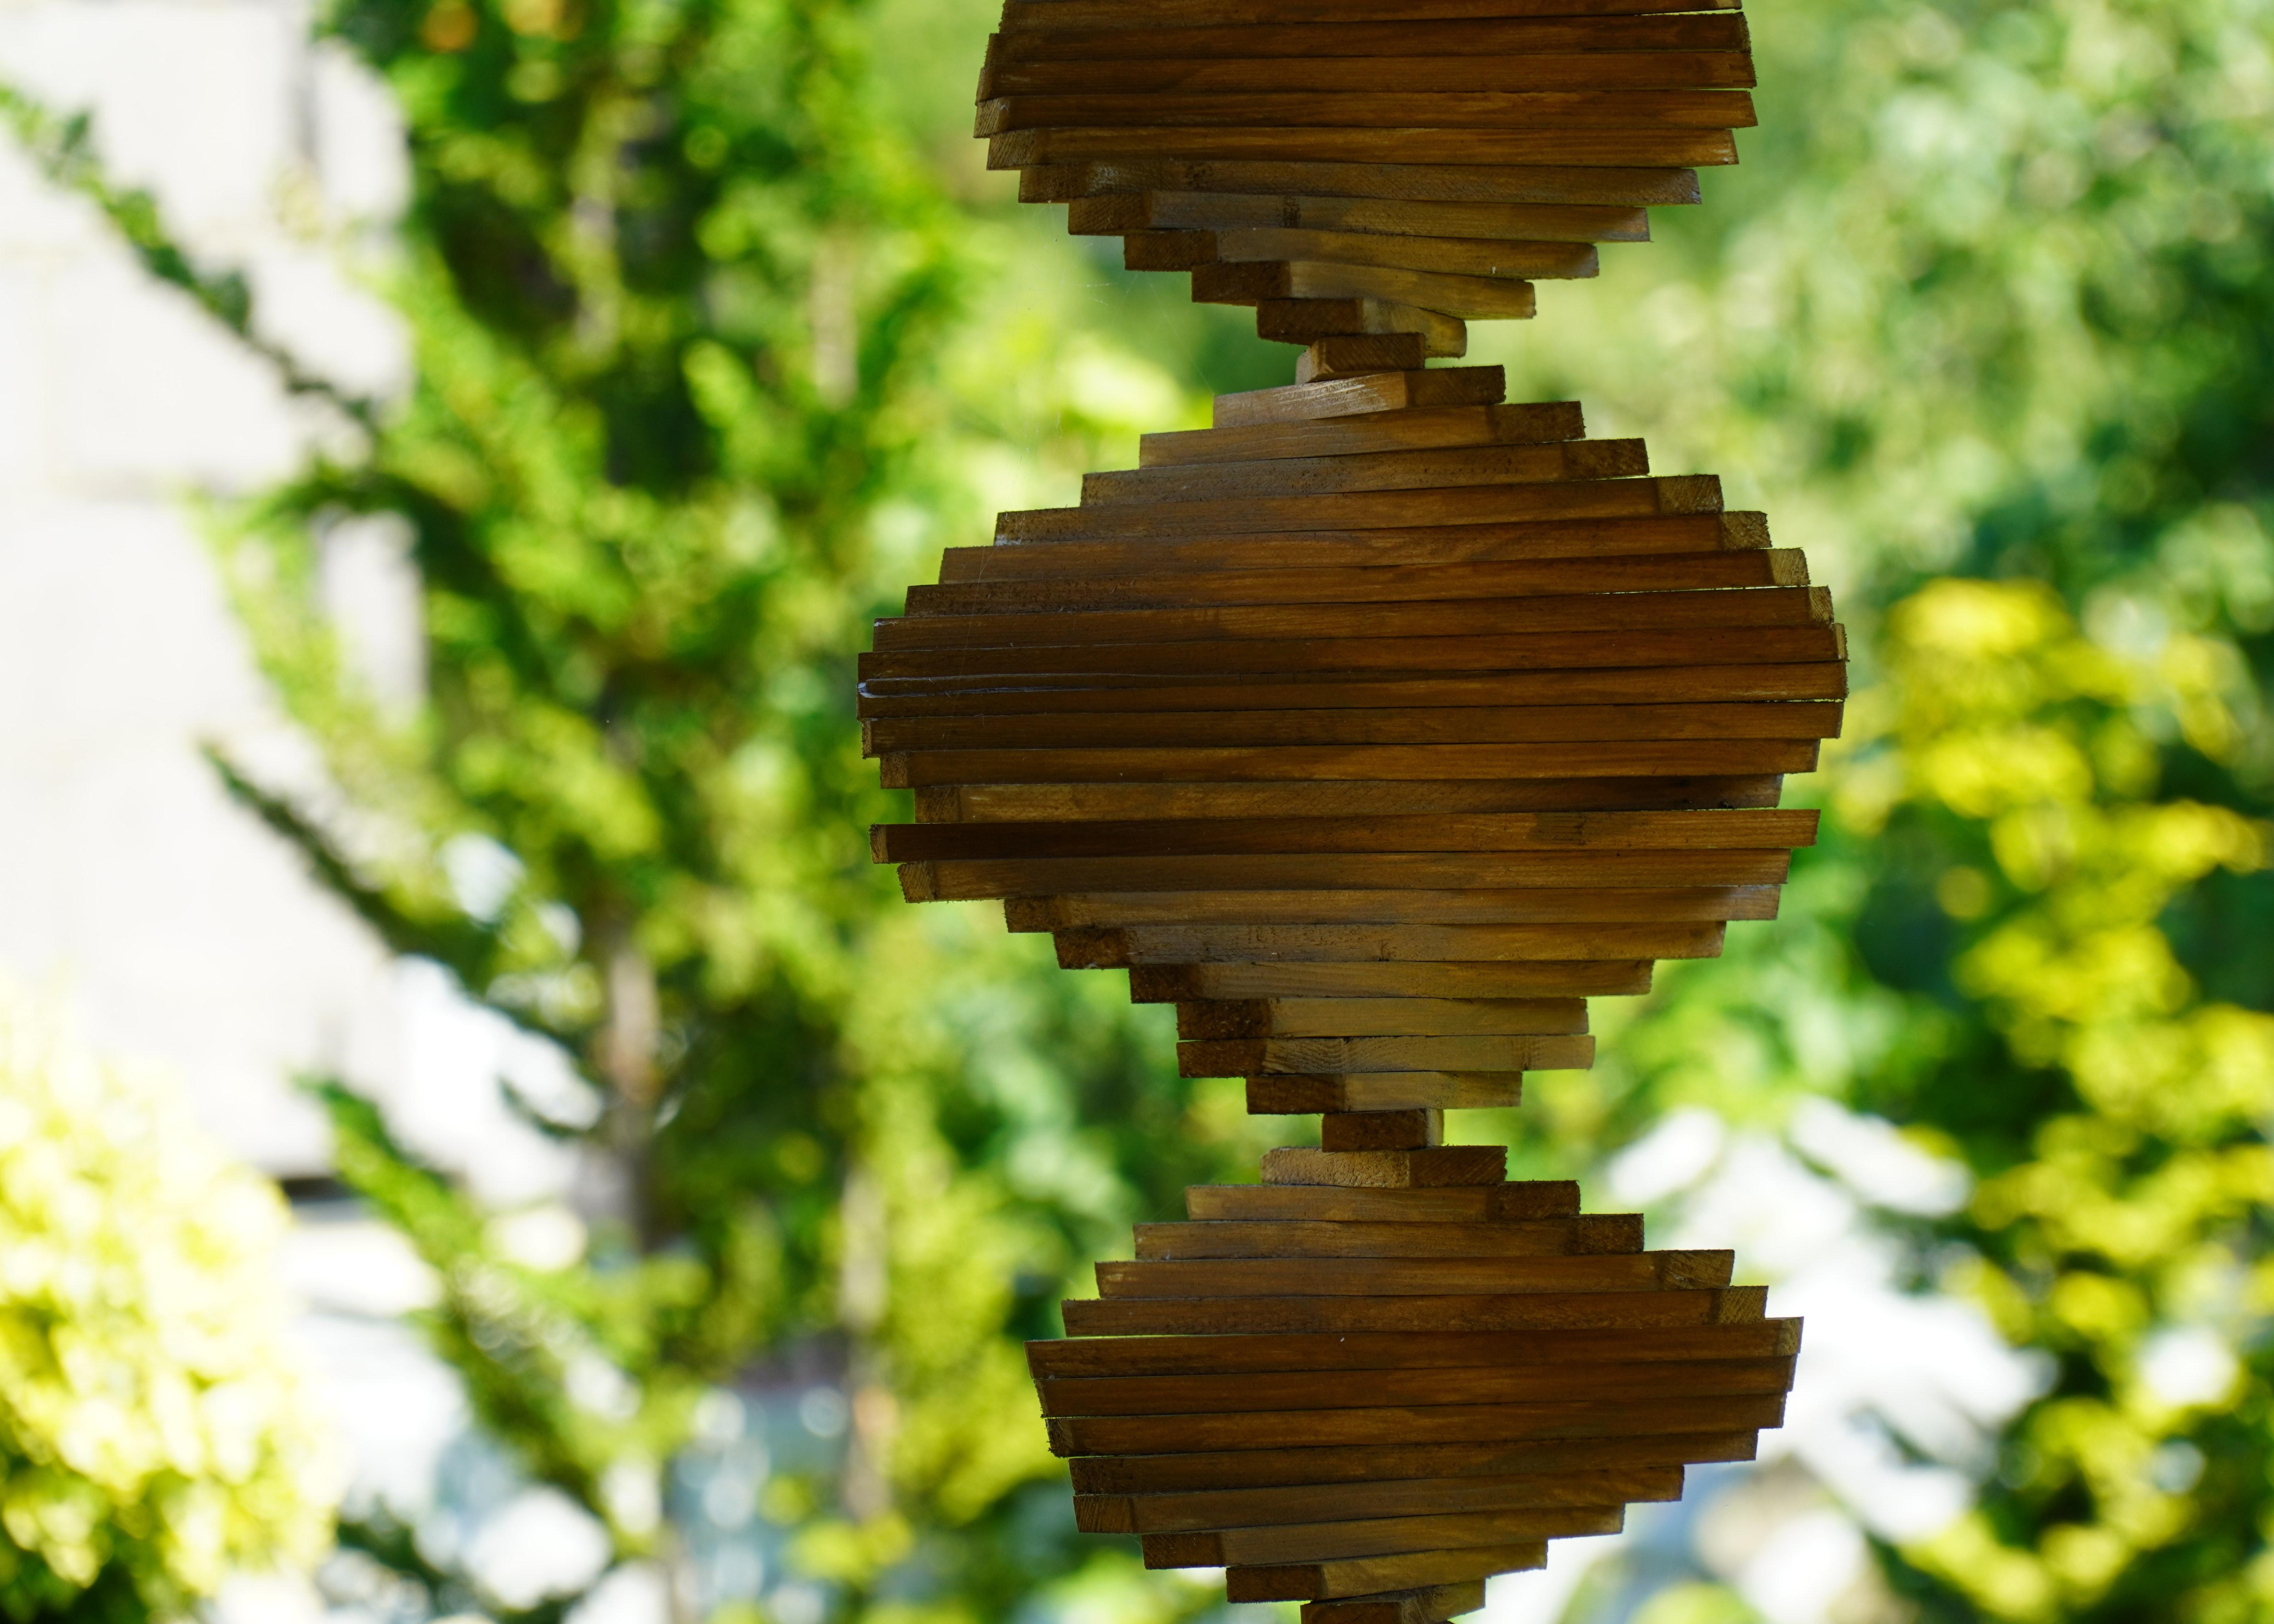 Love, Learn, Play: The Triple Helix of Human Flourishing